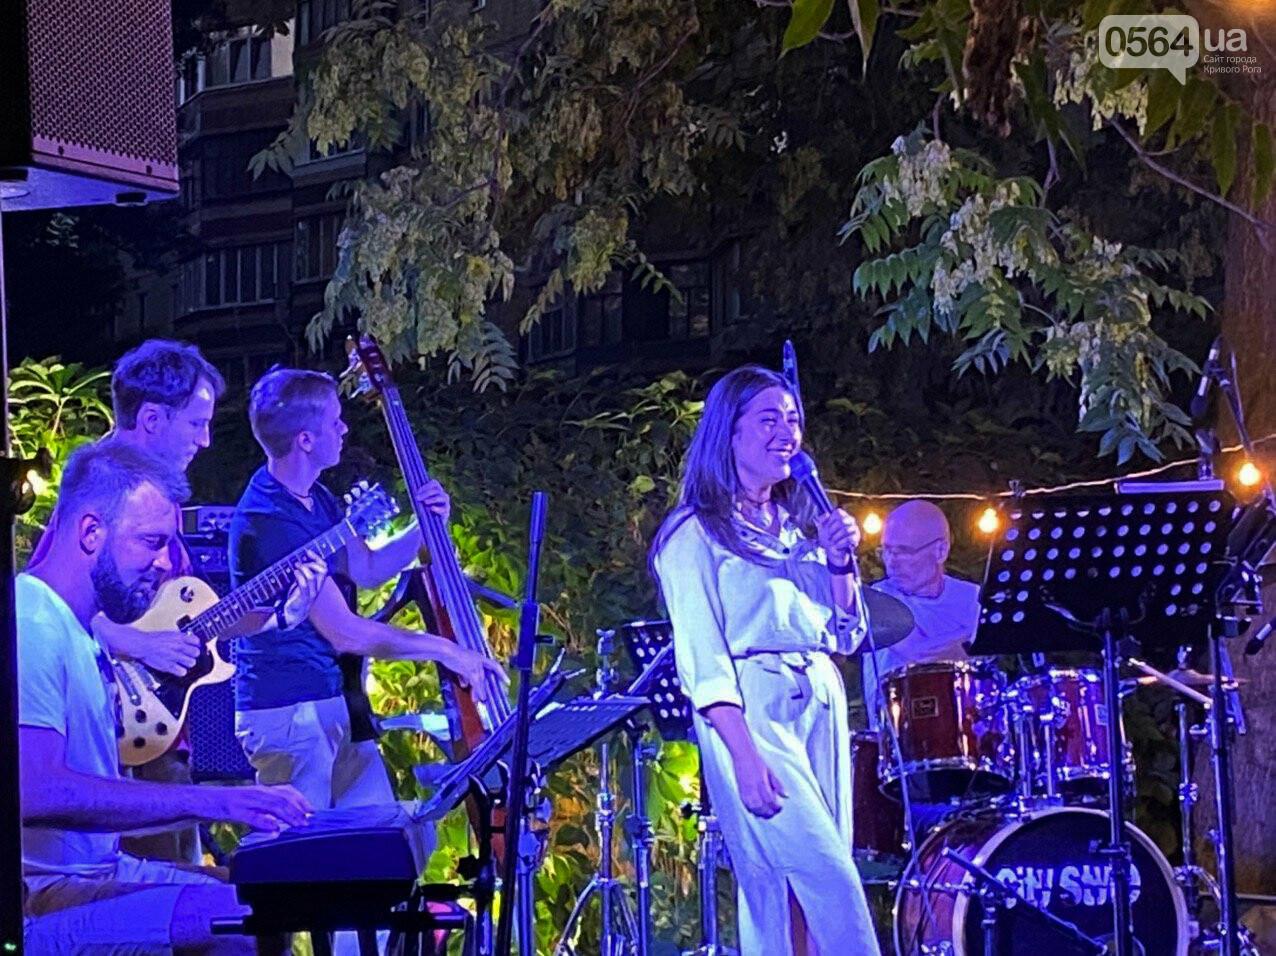 Под звездным небом криворожане наслаждались летним джазом от  Advantage Project, - ФОТО, ВИДЕО , фото-54